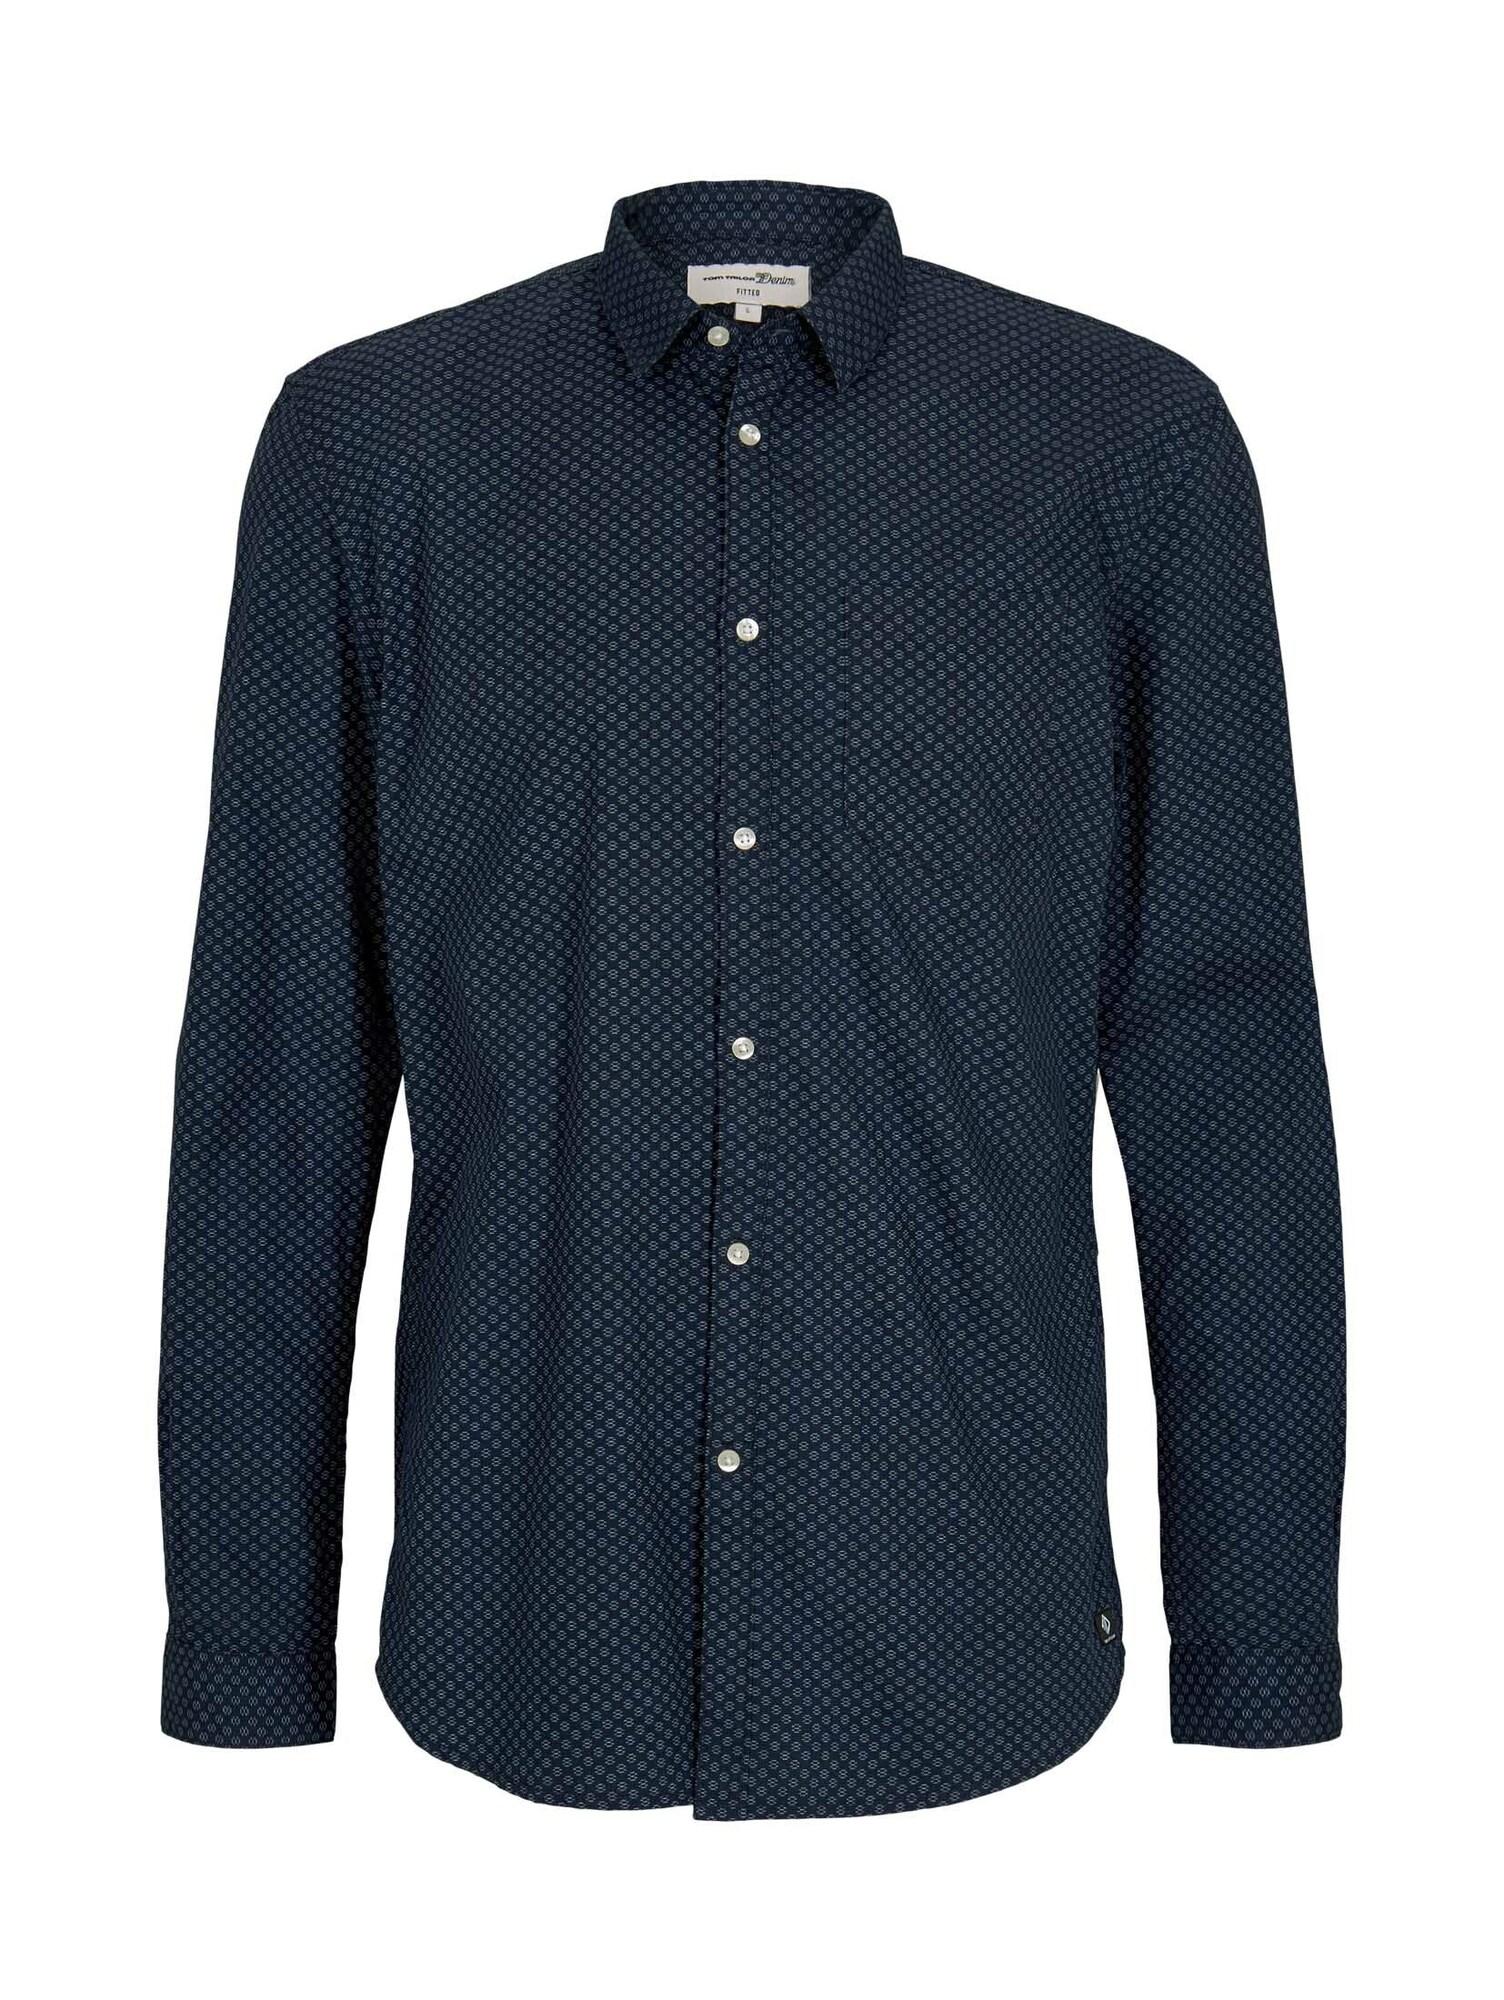 TOM TAILOR DENIM Košile  tmavě modrá / chladná modrá